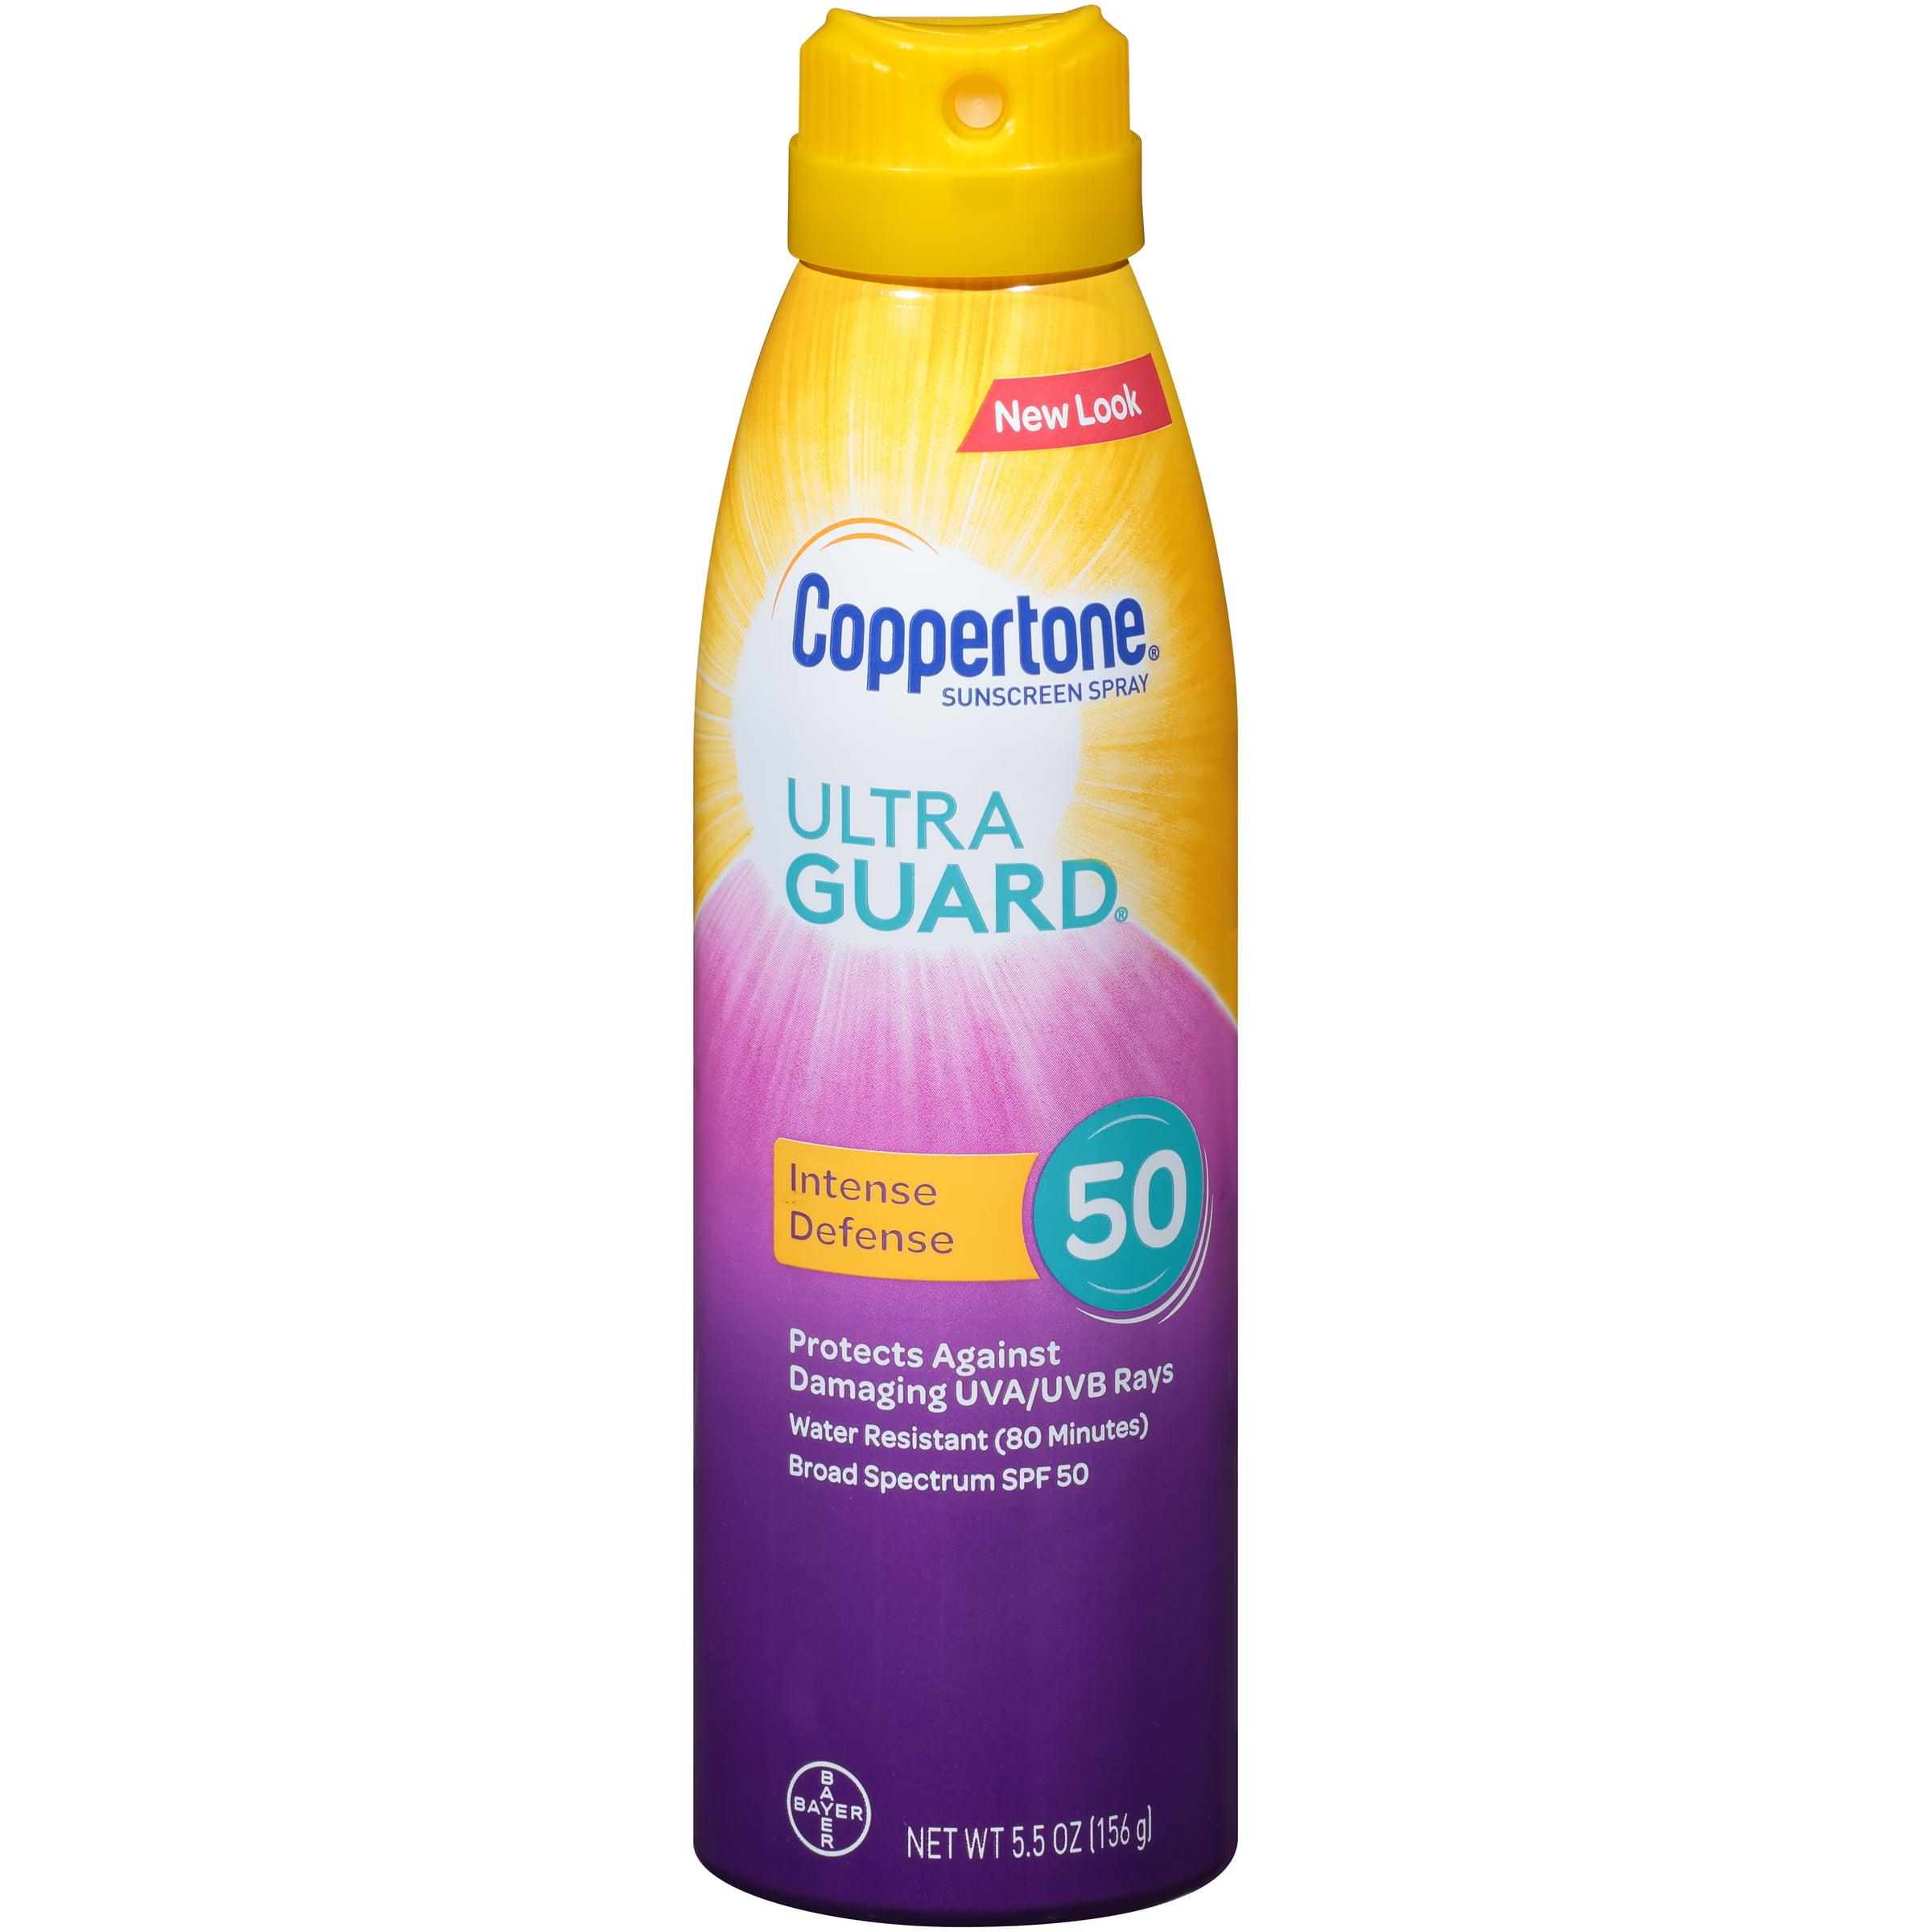 Coppertone Ultra Guard Sunscreen Continuous Spray SPF 50, 5.5 oz